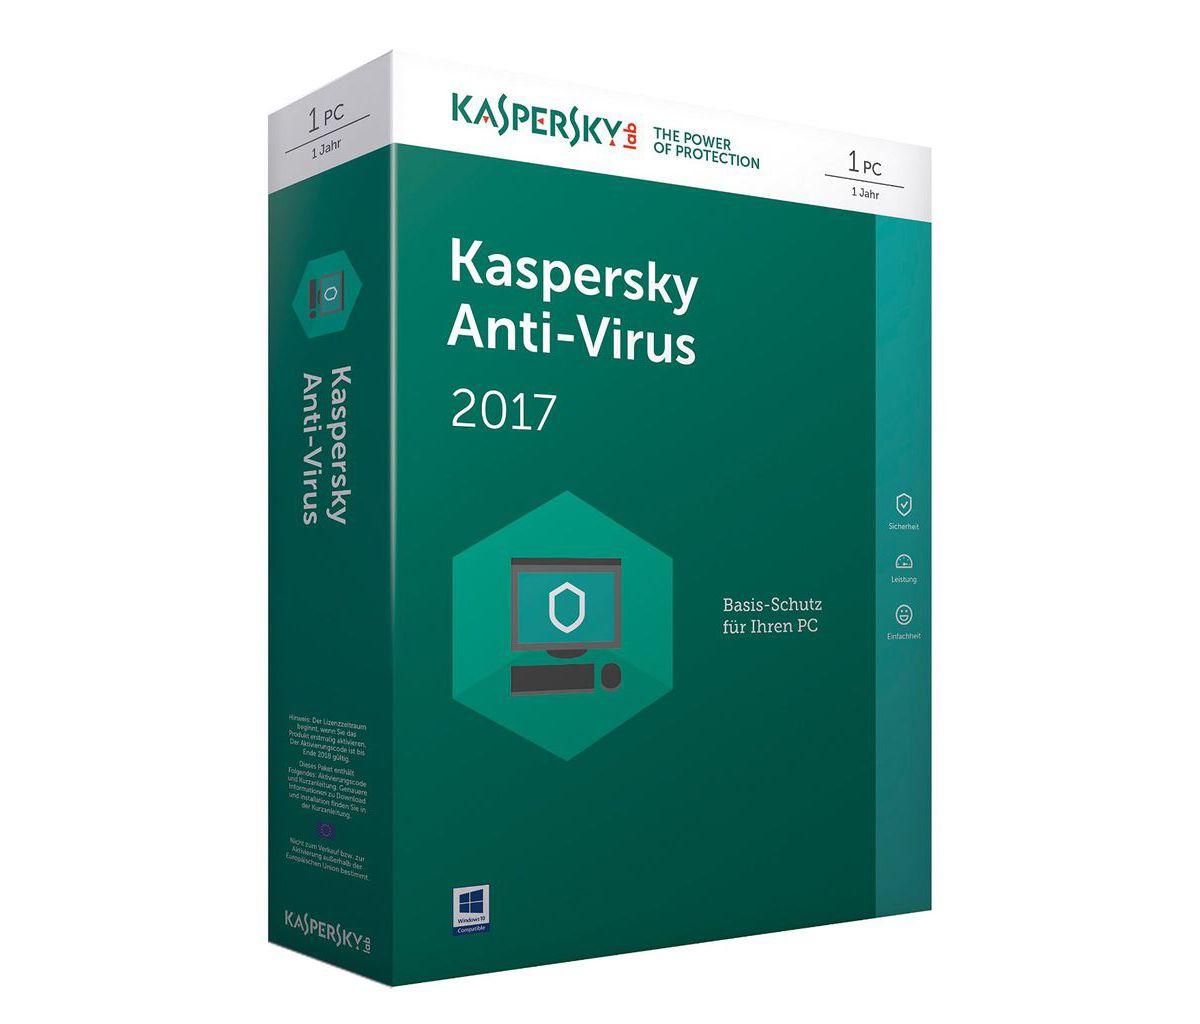 Kaspersky Software »Kaspersky Anti-Virus 2017 Upgrade«